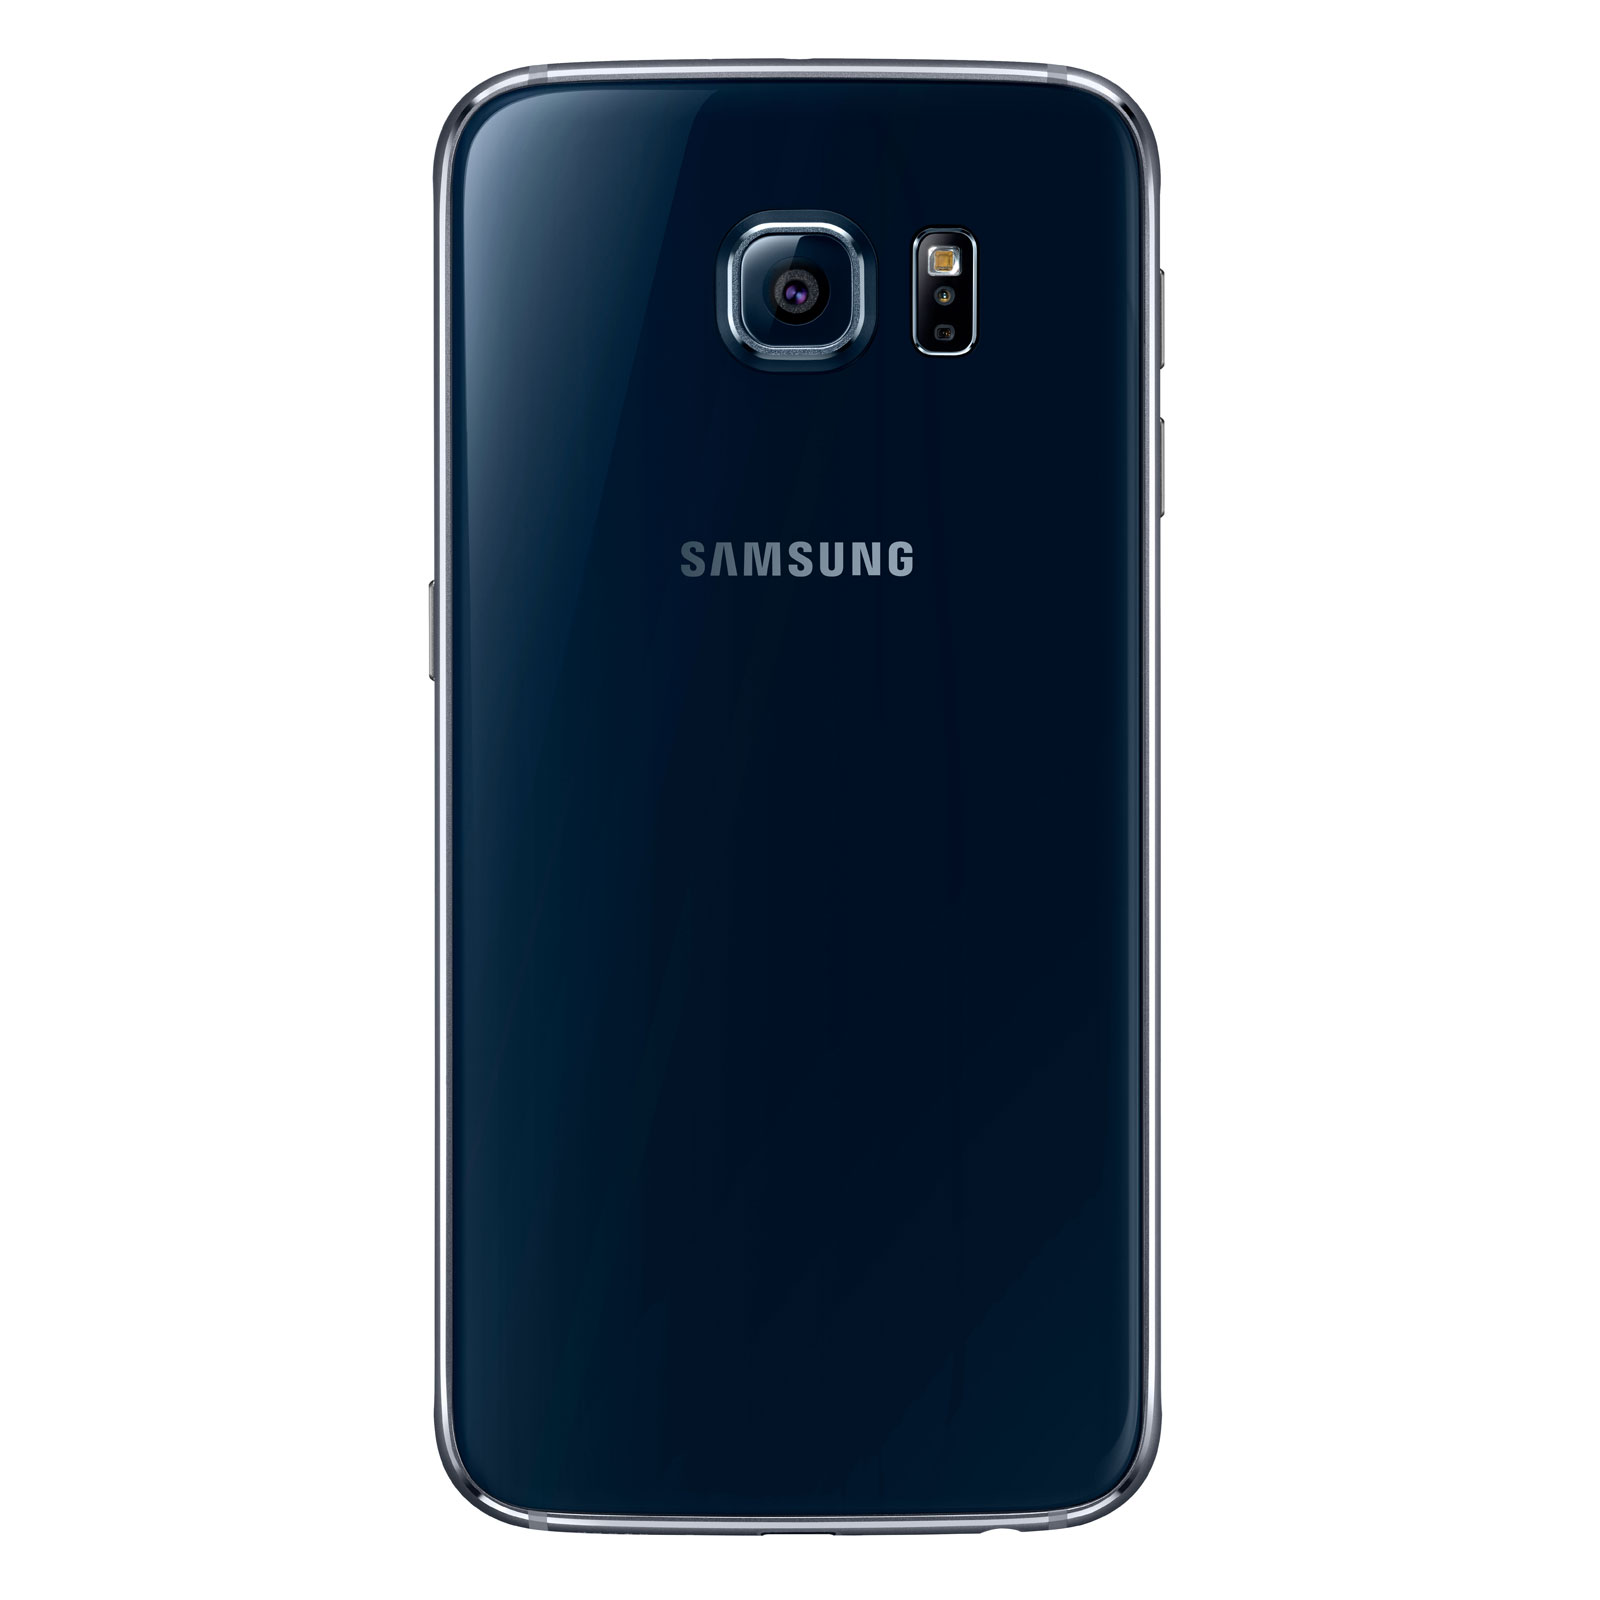 samsung galaxy s6 sm g920f noir 32 go mobile smartphone samsung sur. Black Bedroom Furniture Sets. Home Design Ideas